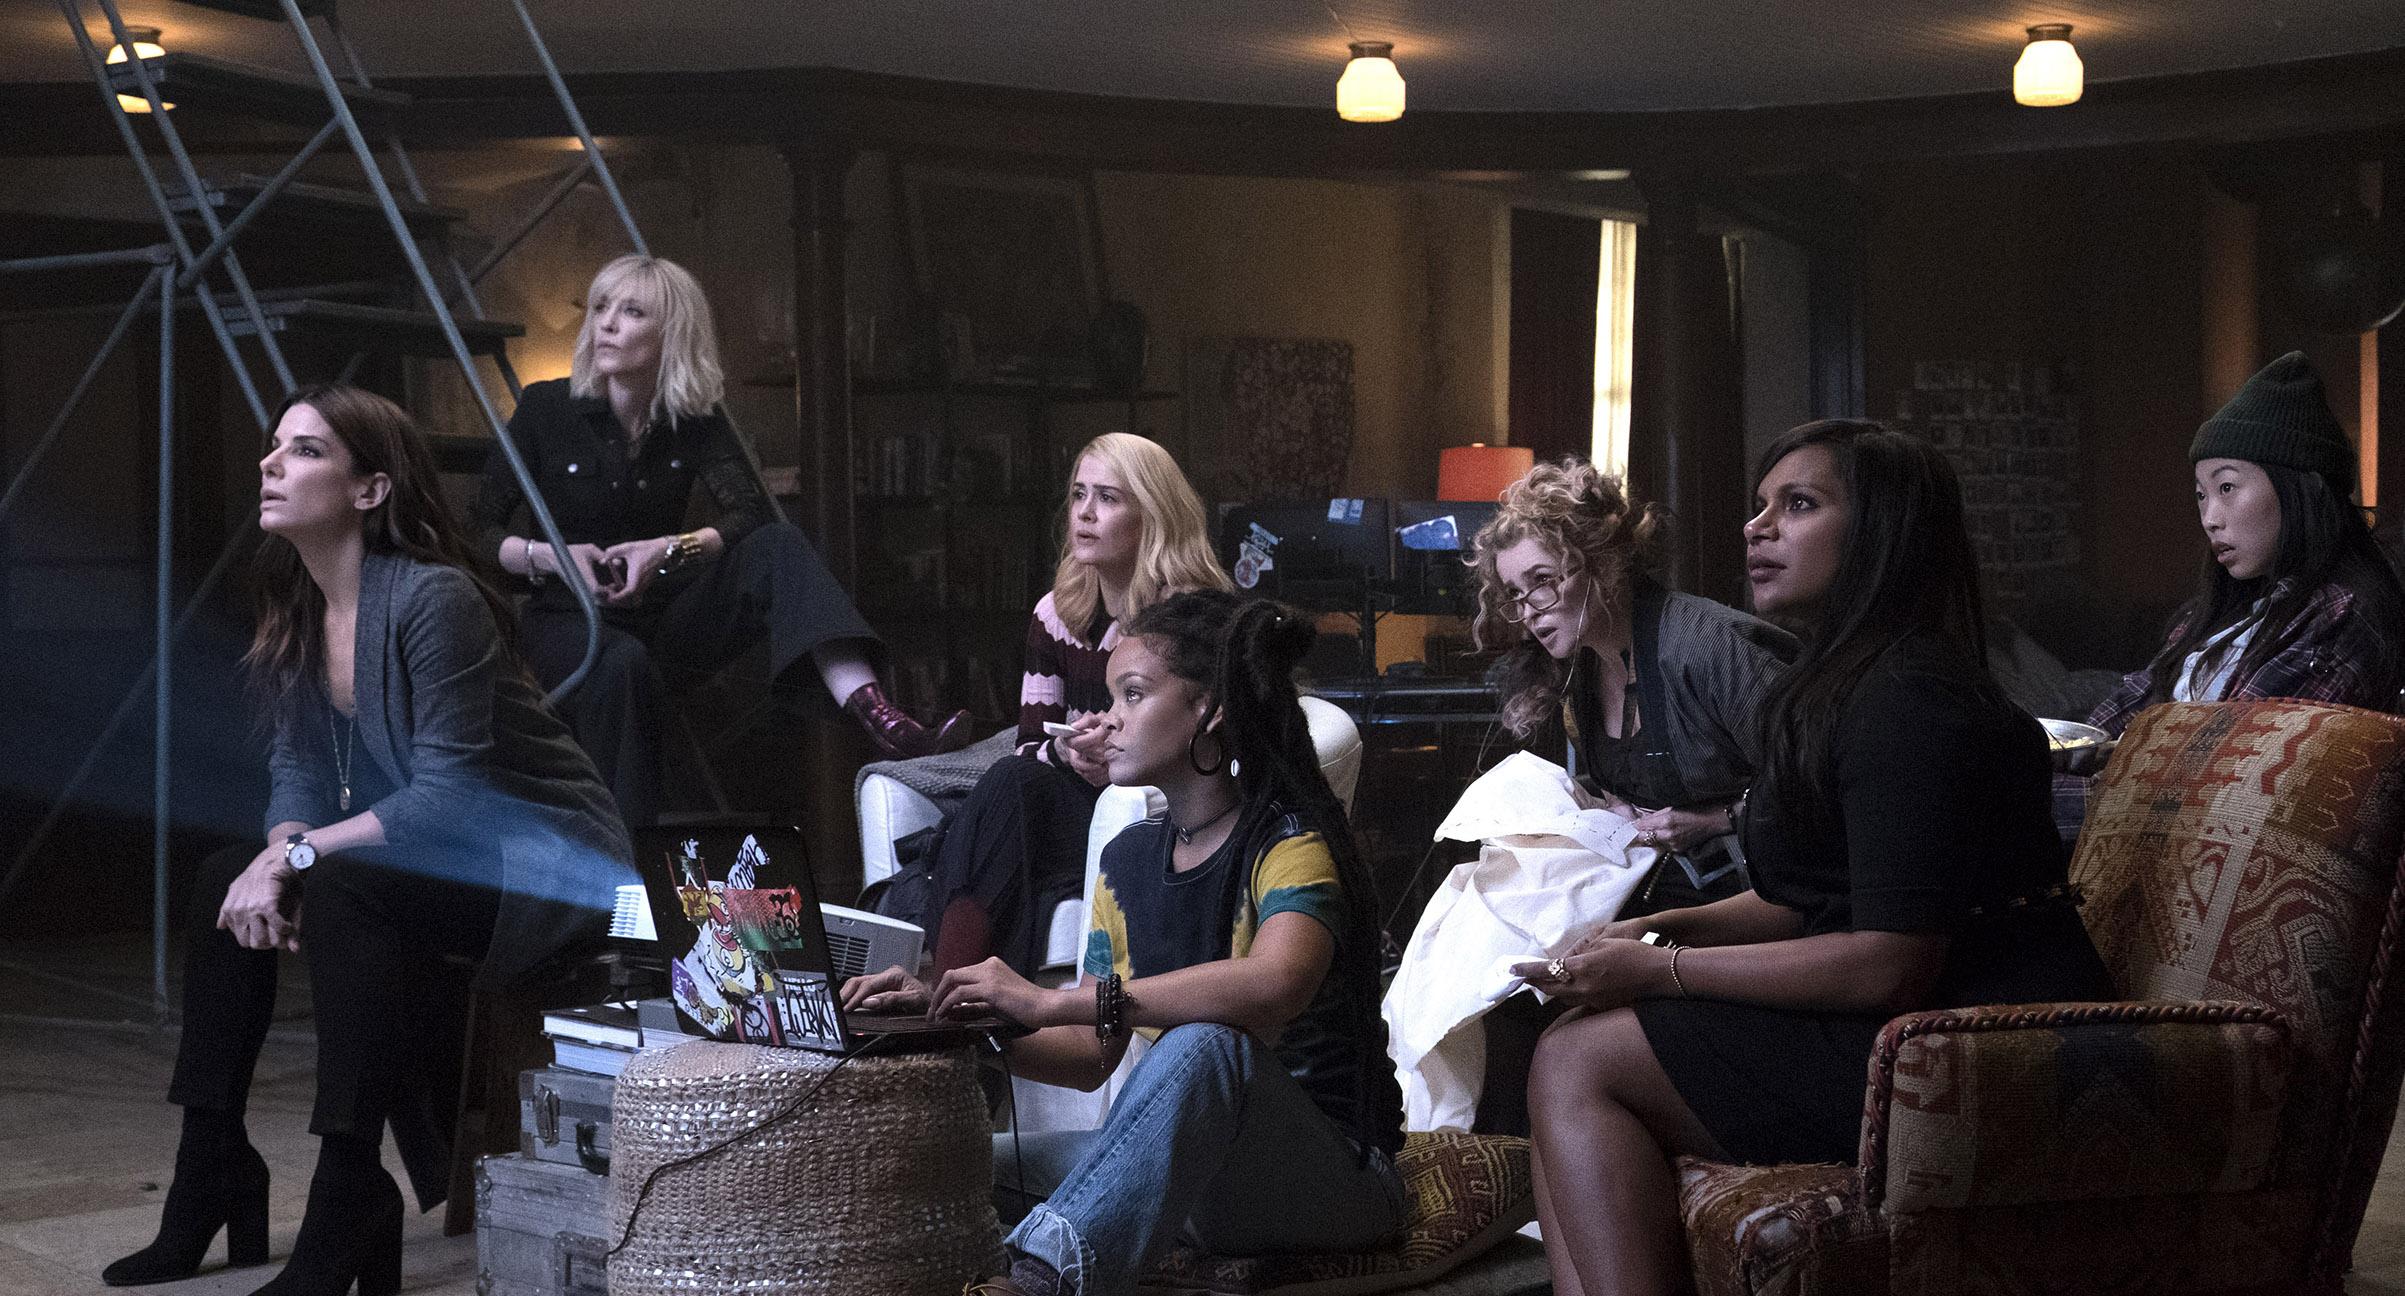 Meet The Crew From left to right: Sandra Bullock,  Cate Blanchett, Sarah Paulson, Rihanna, Helena Bonham Carter, Mindy Kaling and Awkwafina starring in Ocean's 8